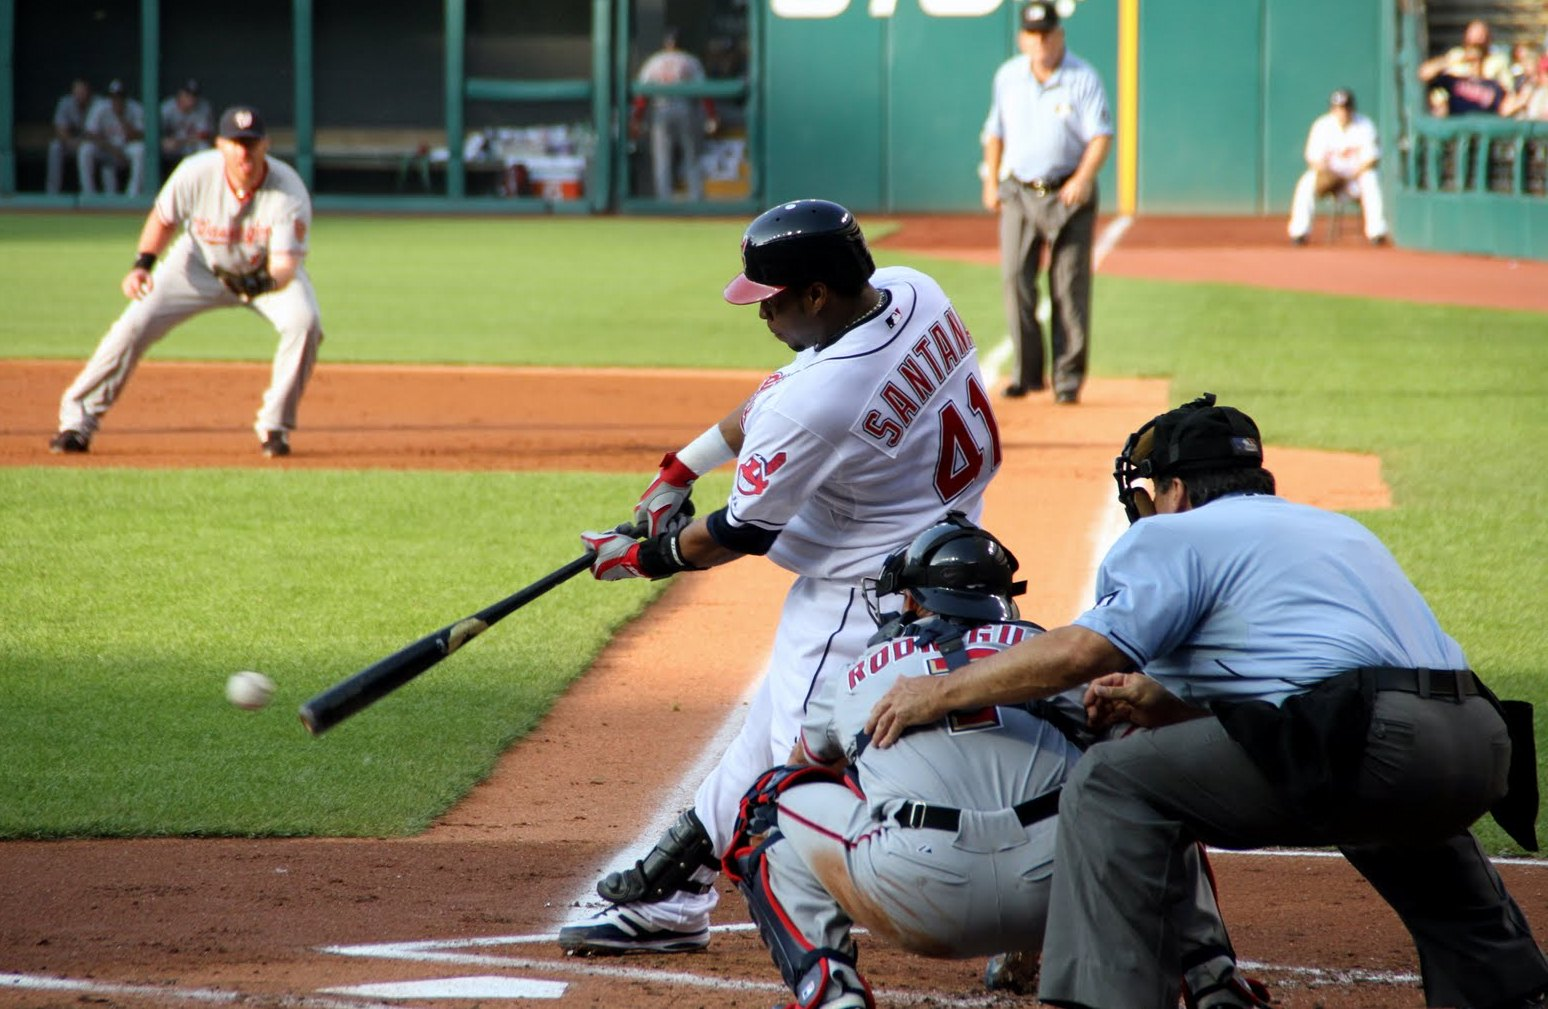 Will Santana find a home at third base?